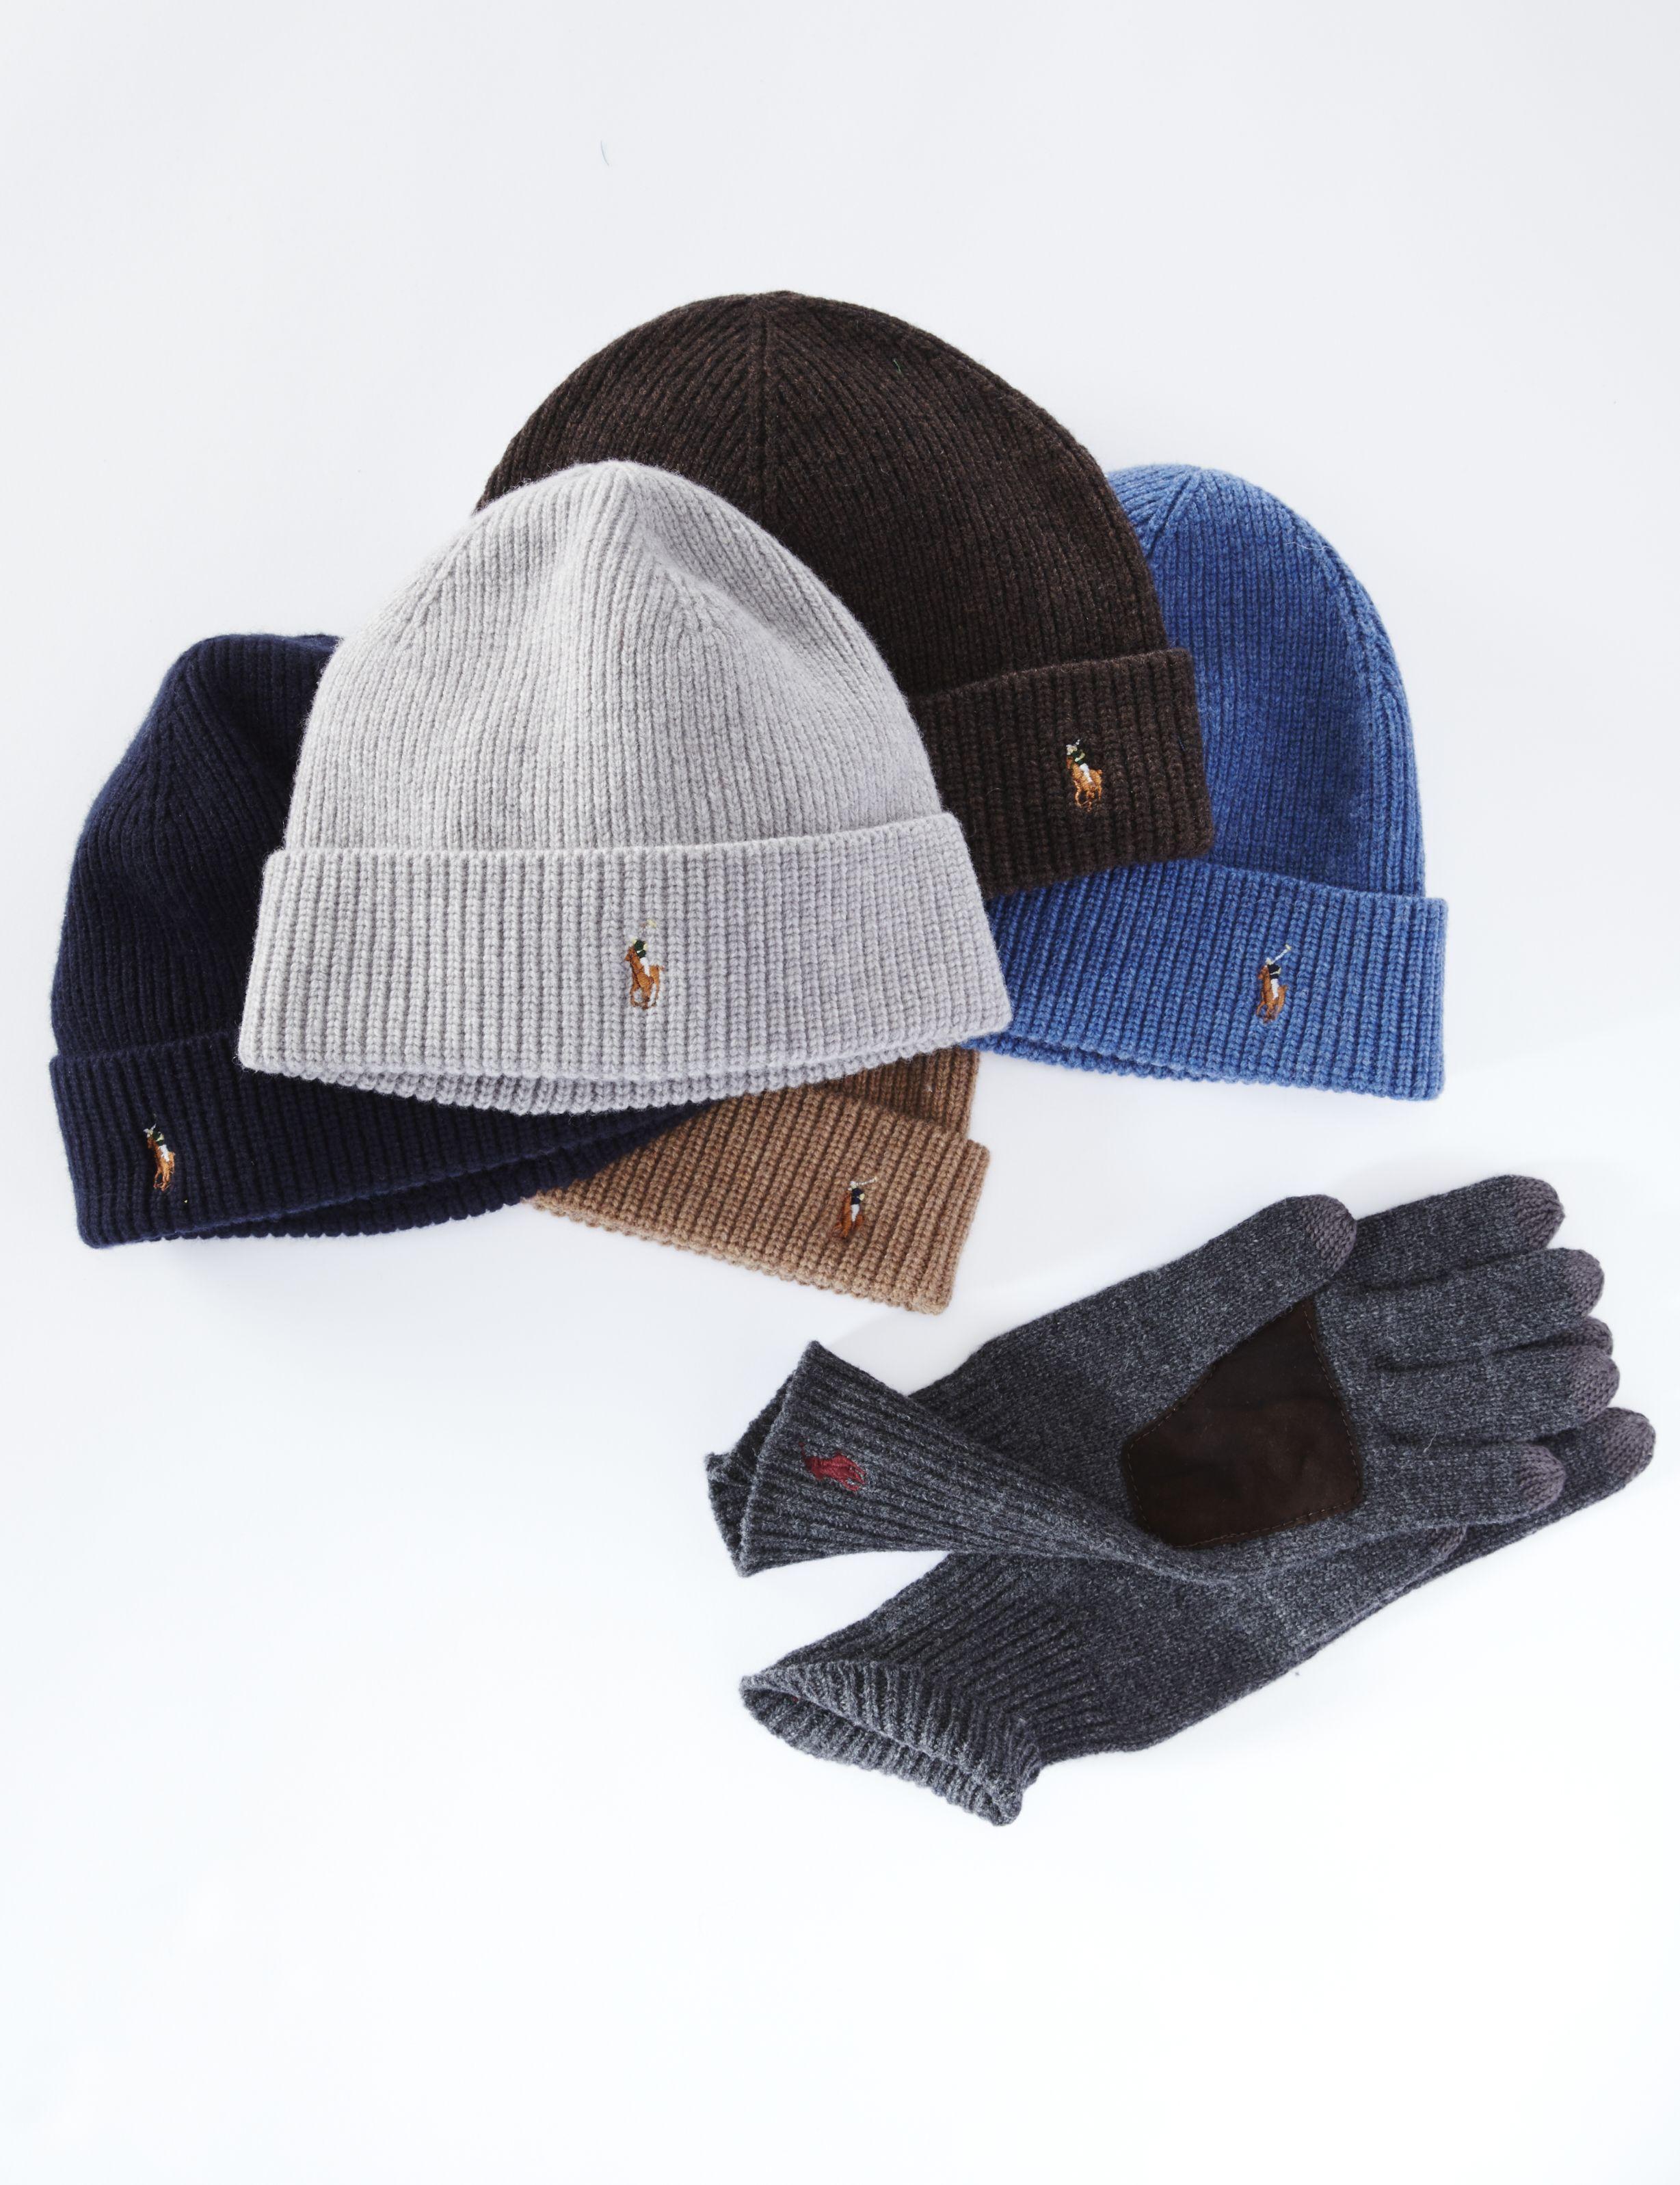 46888445b3a Polo Holiday Signature Merino Cuff Hat